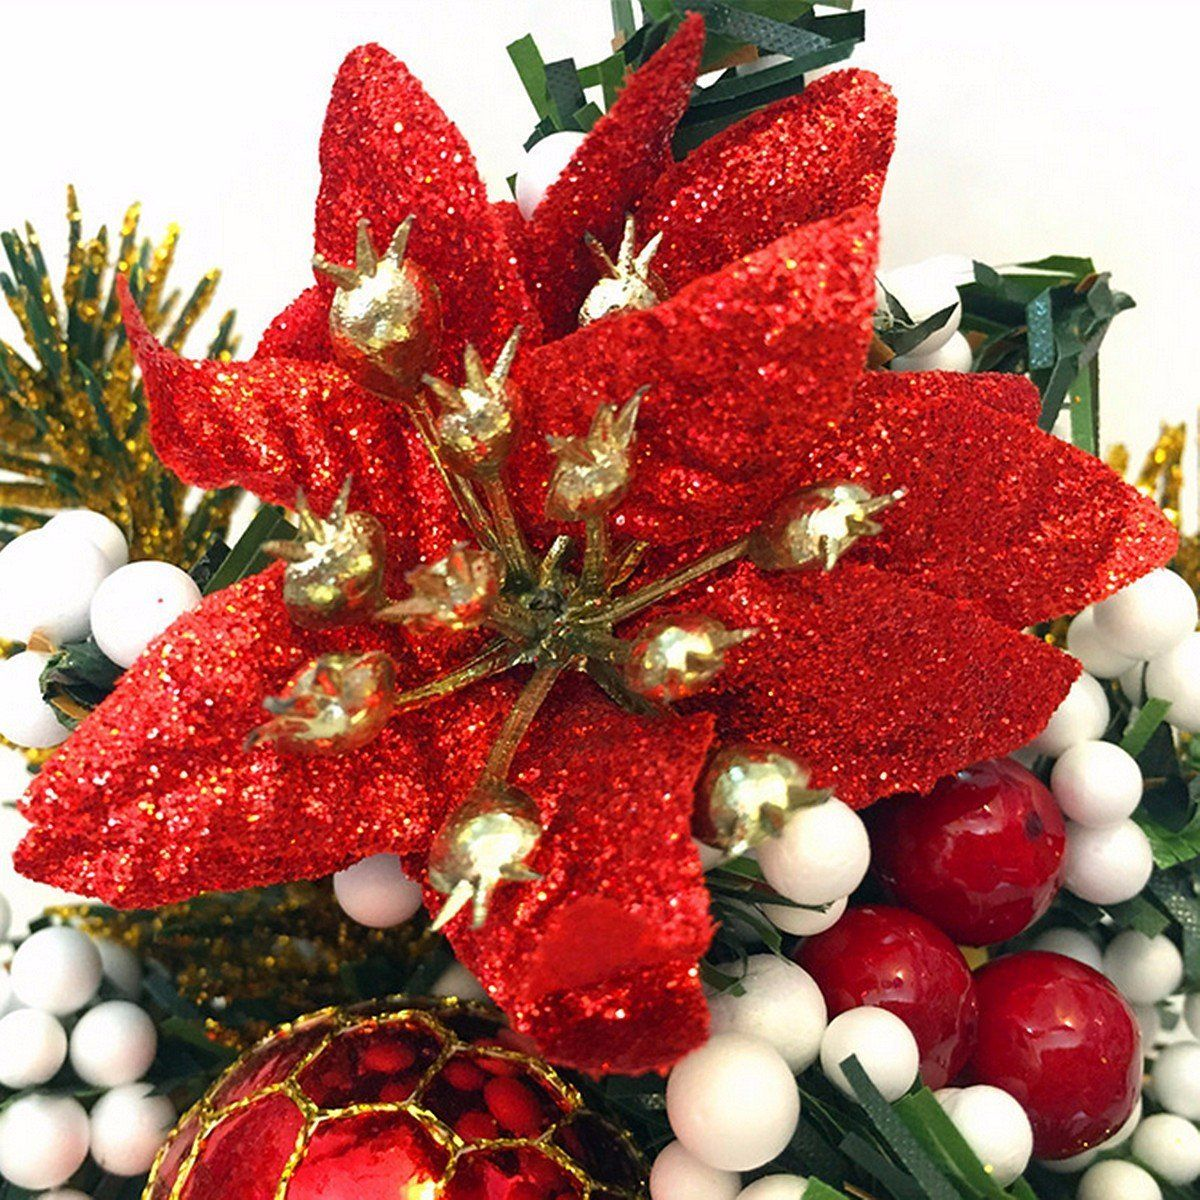 Decro For Home Office Decro Xmas Gift Mini Christmas Tree Desk Table Decor